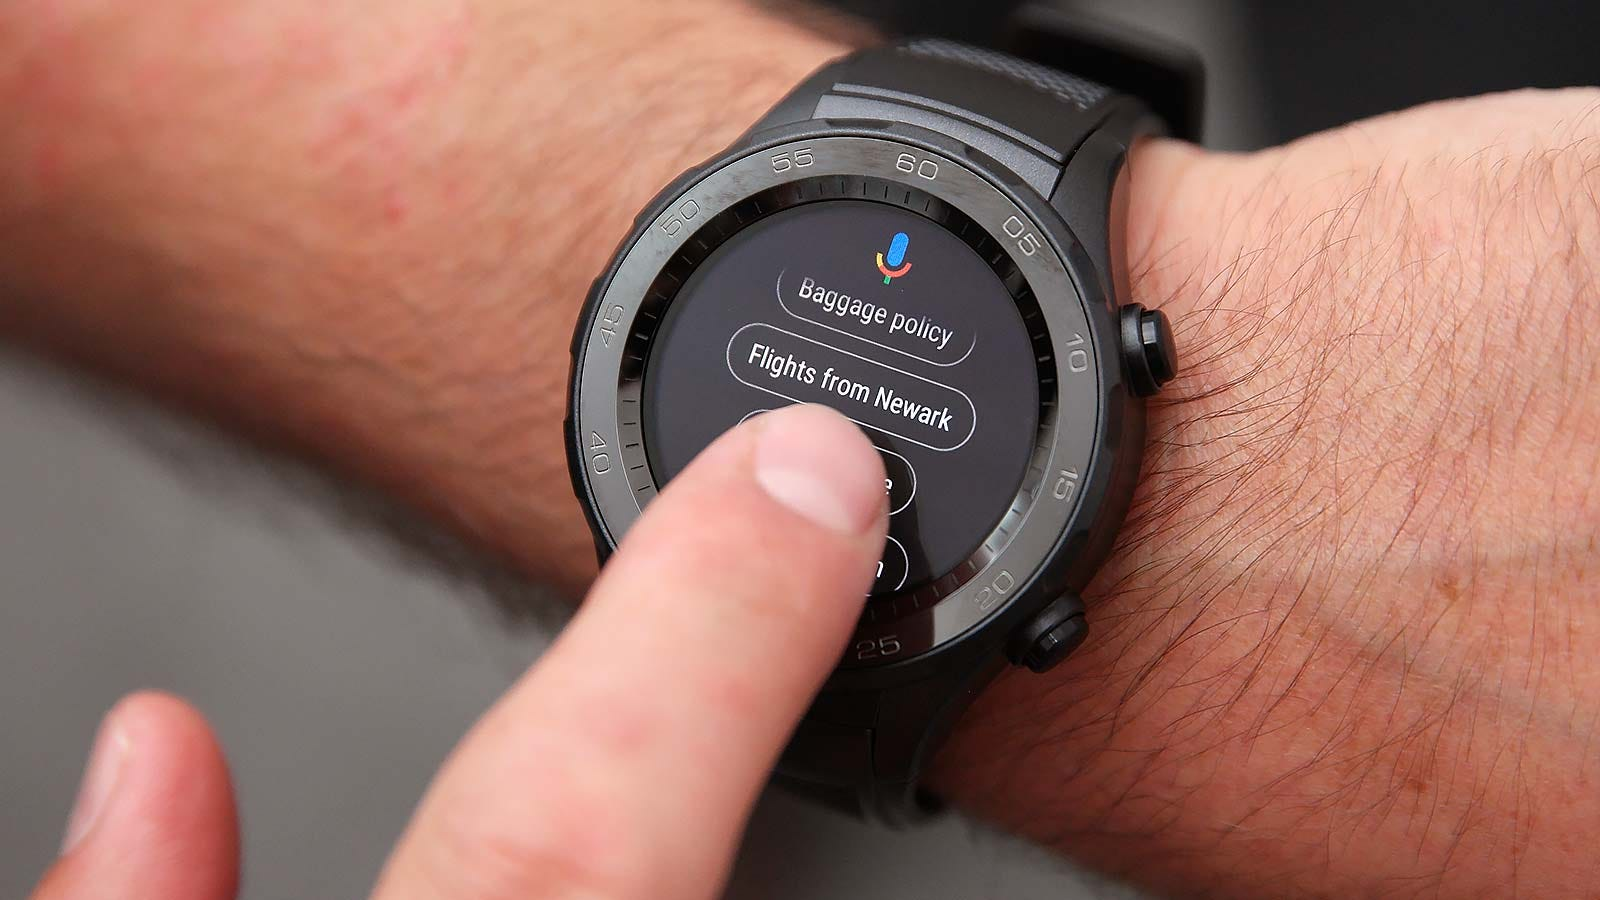 Report: Google Finally Has a Plan to Make a Good Smartwatch